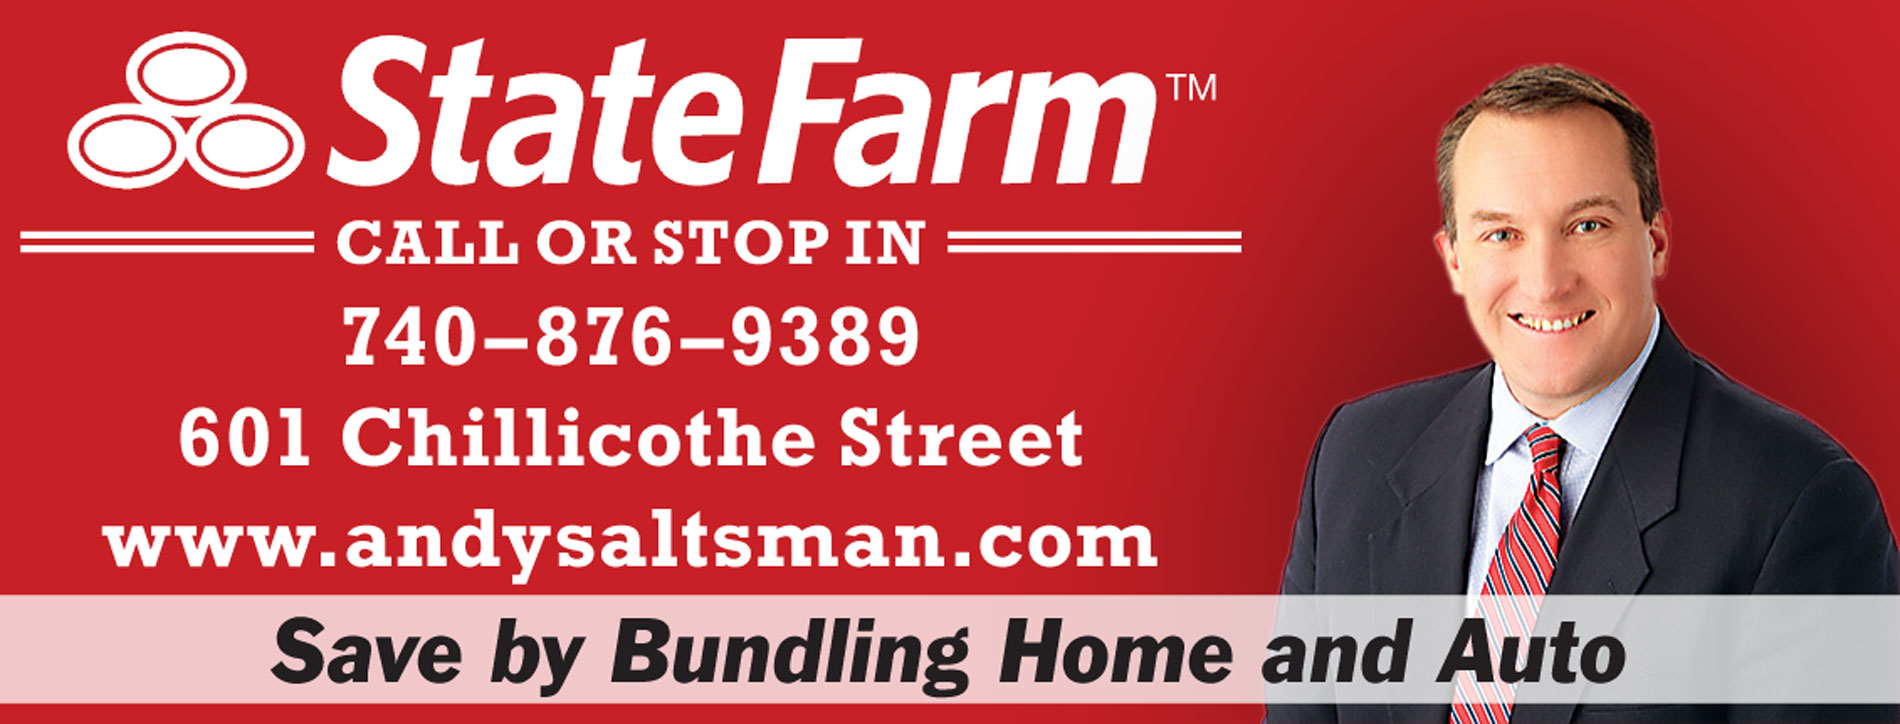 State Farm ad